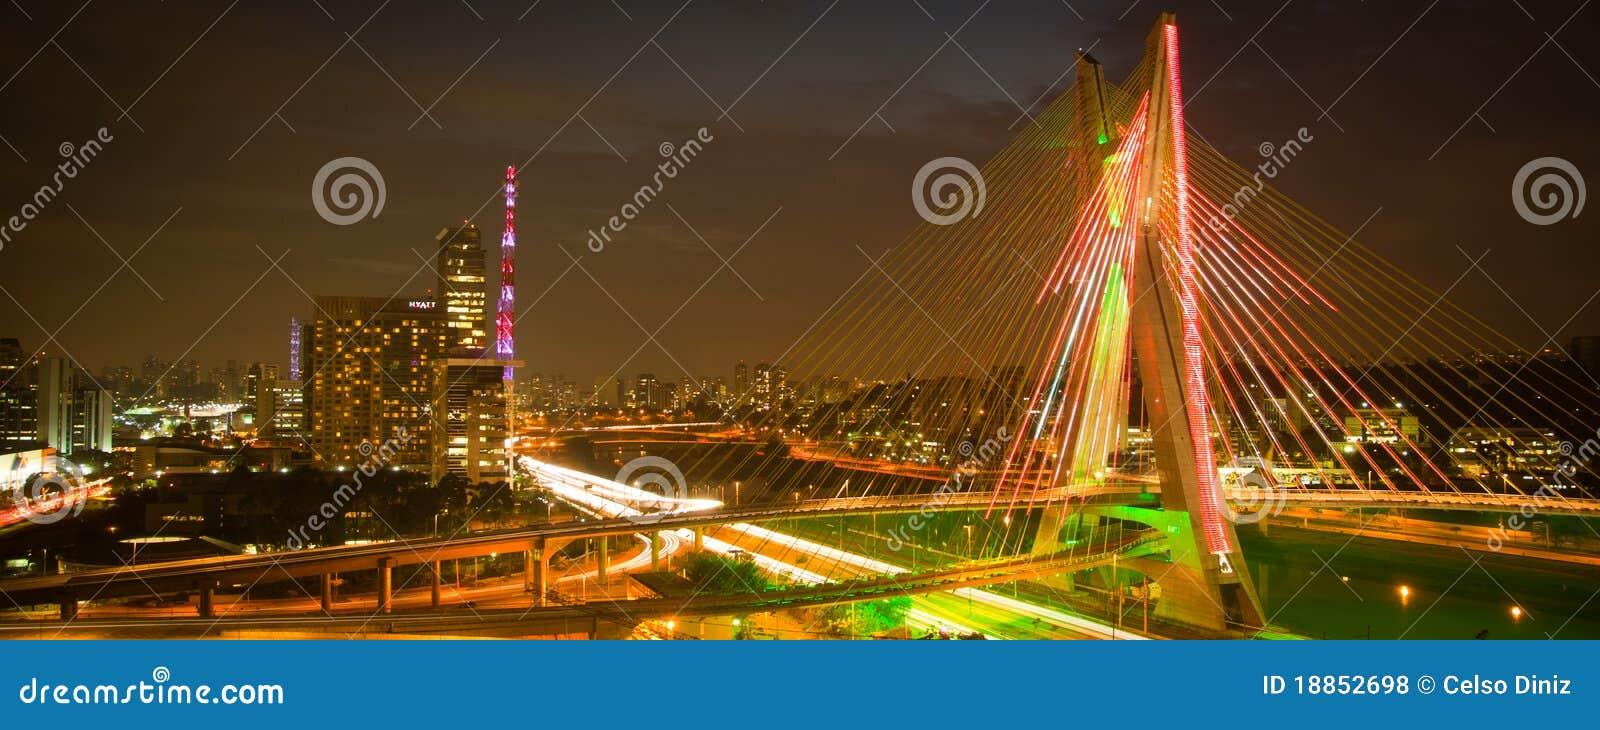 Sao Paulo city bridge at night